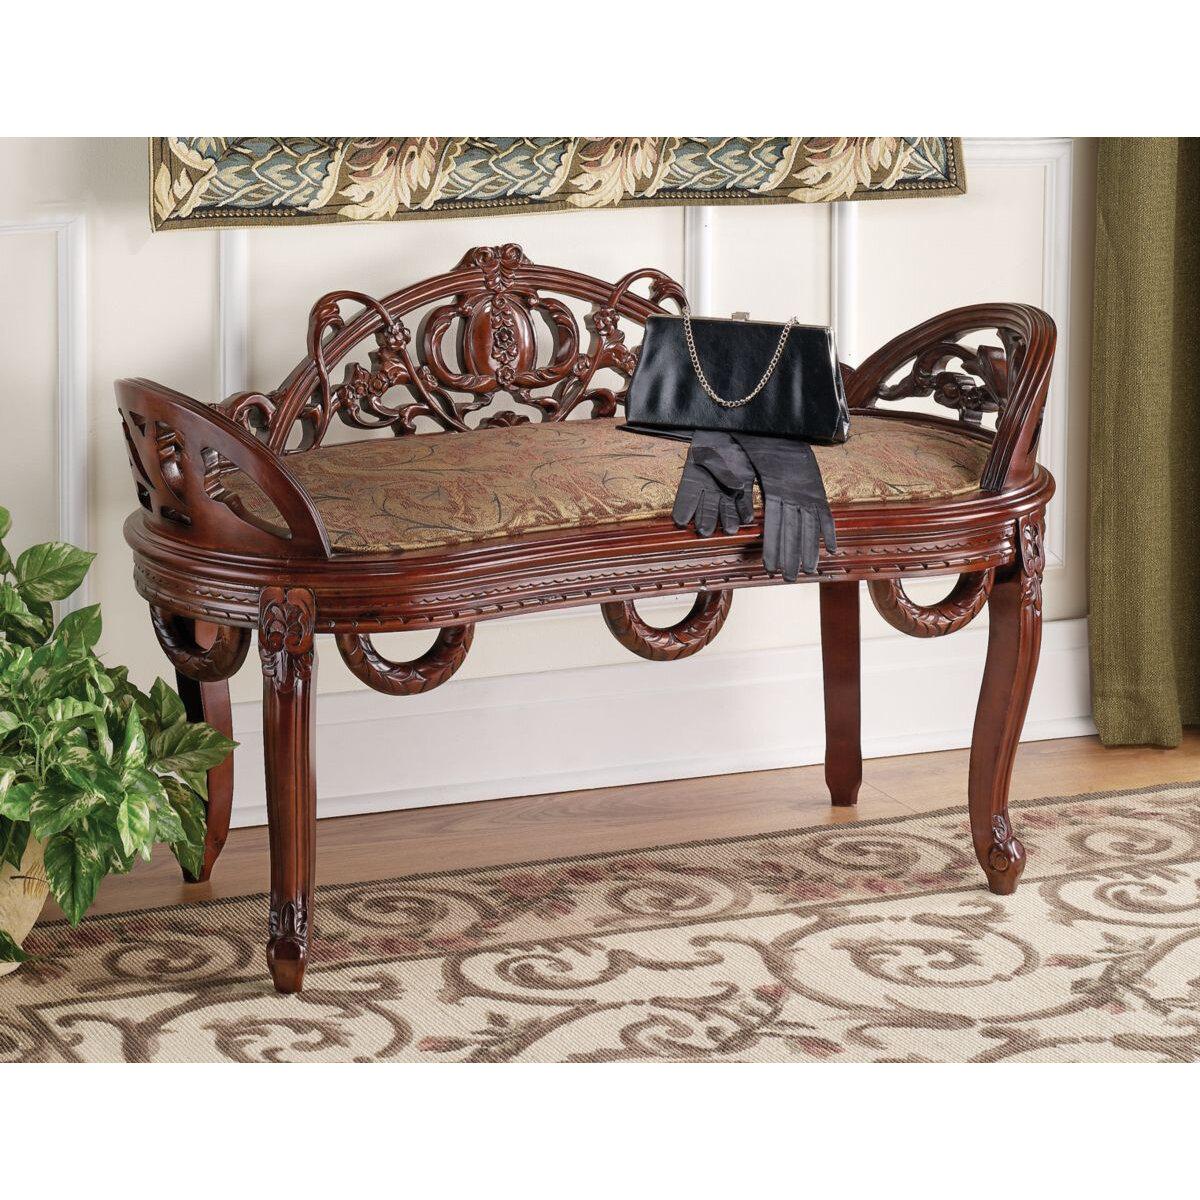 Astounding Constance Filigree Wood Garden Bench Uwap Interior Chair Design Uwaporg